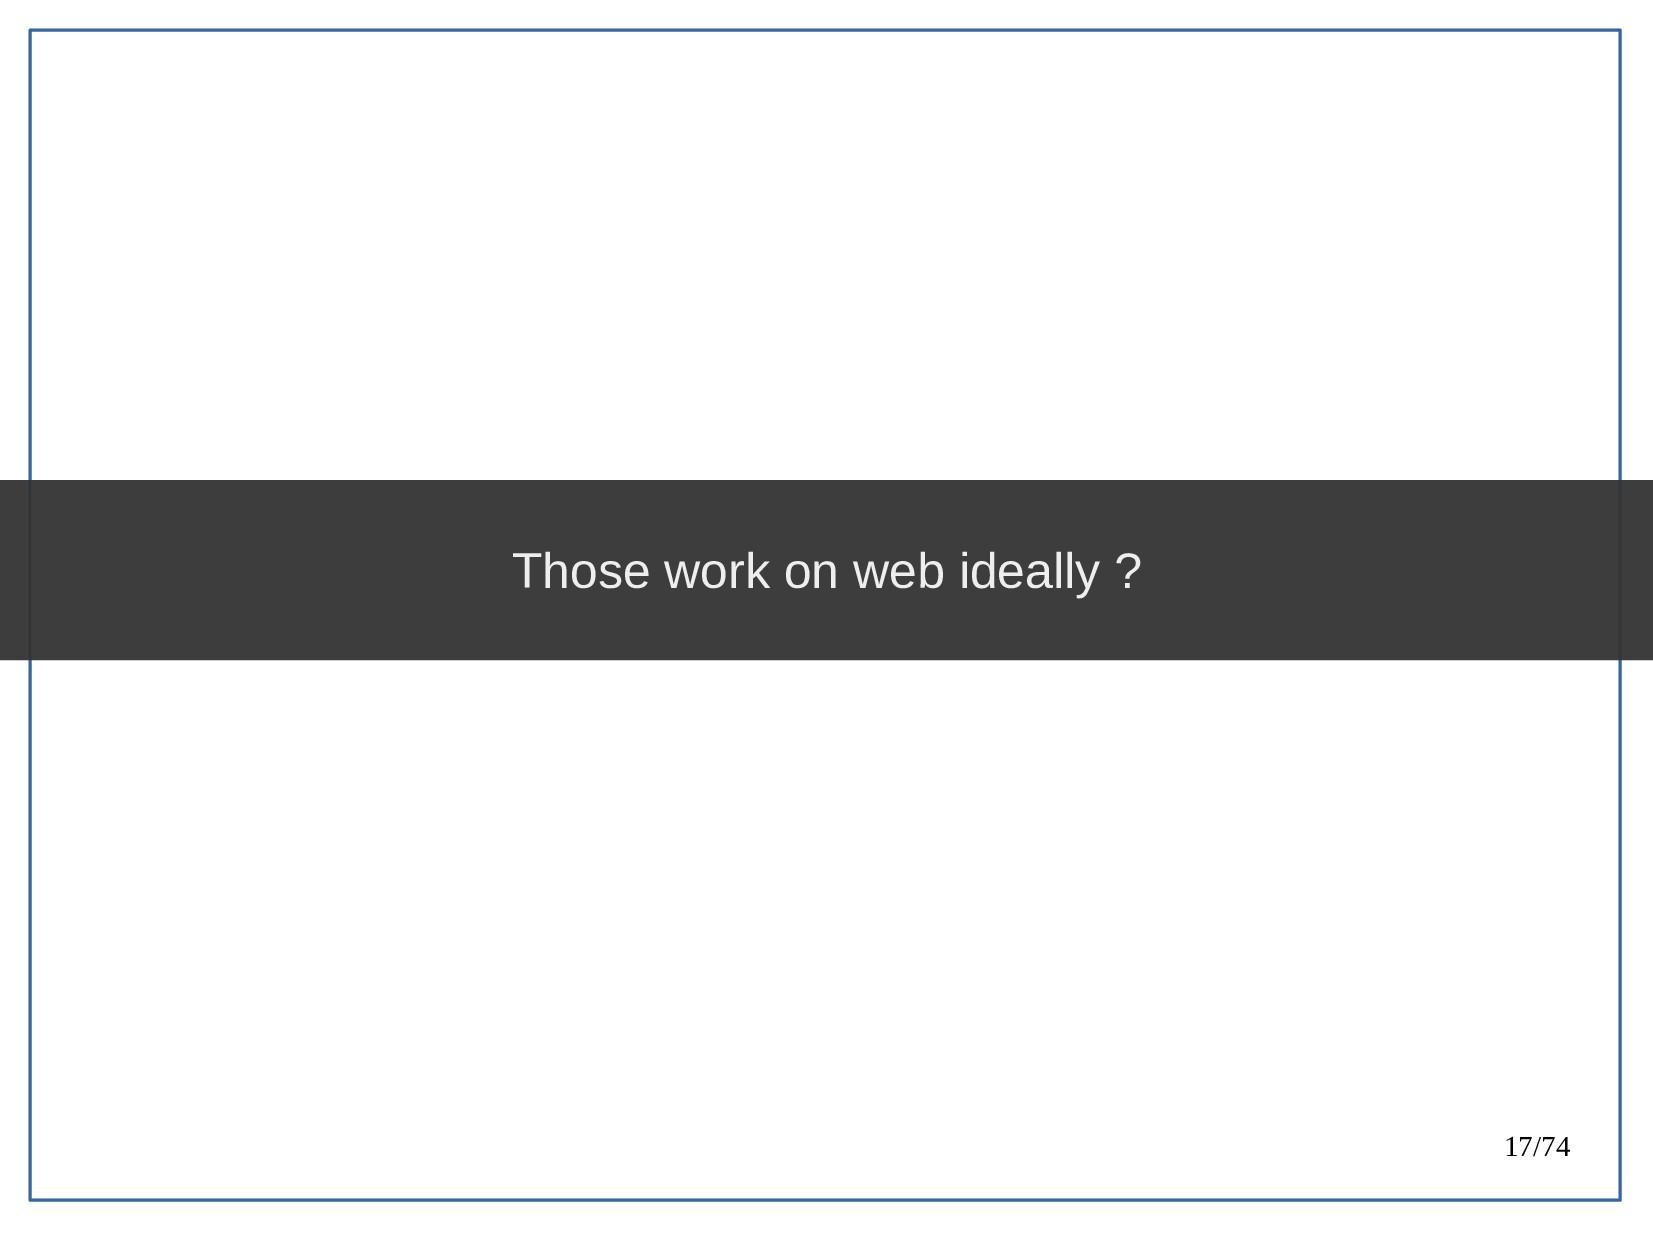 17/74 Those work on web ideally ?